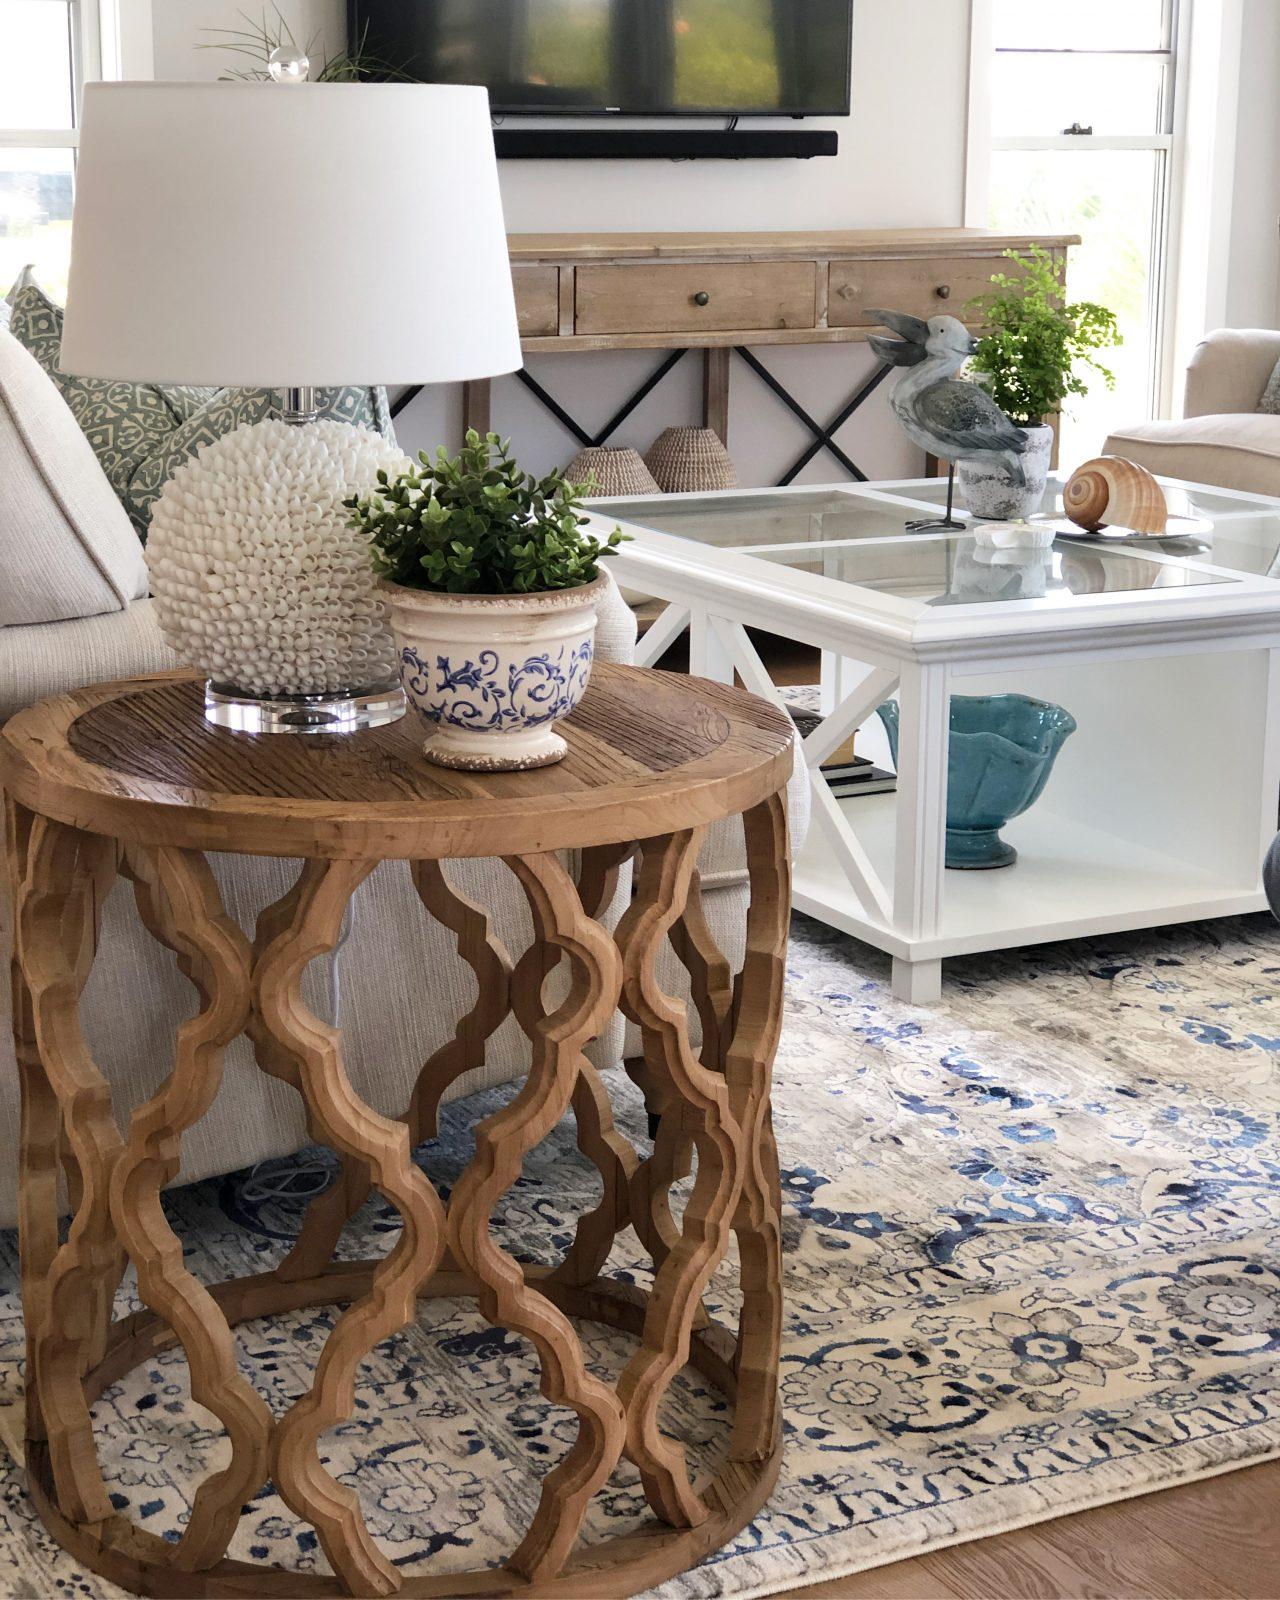 Redland-Bay-Interior-Design-Coastal-Hampton-1280x1600.jpeg